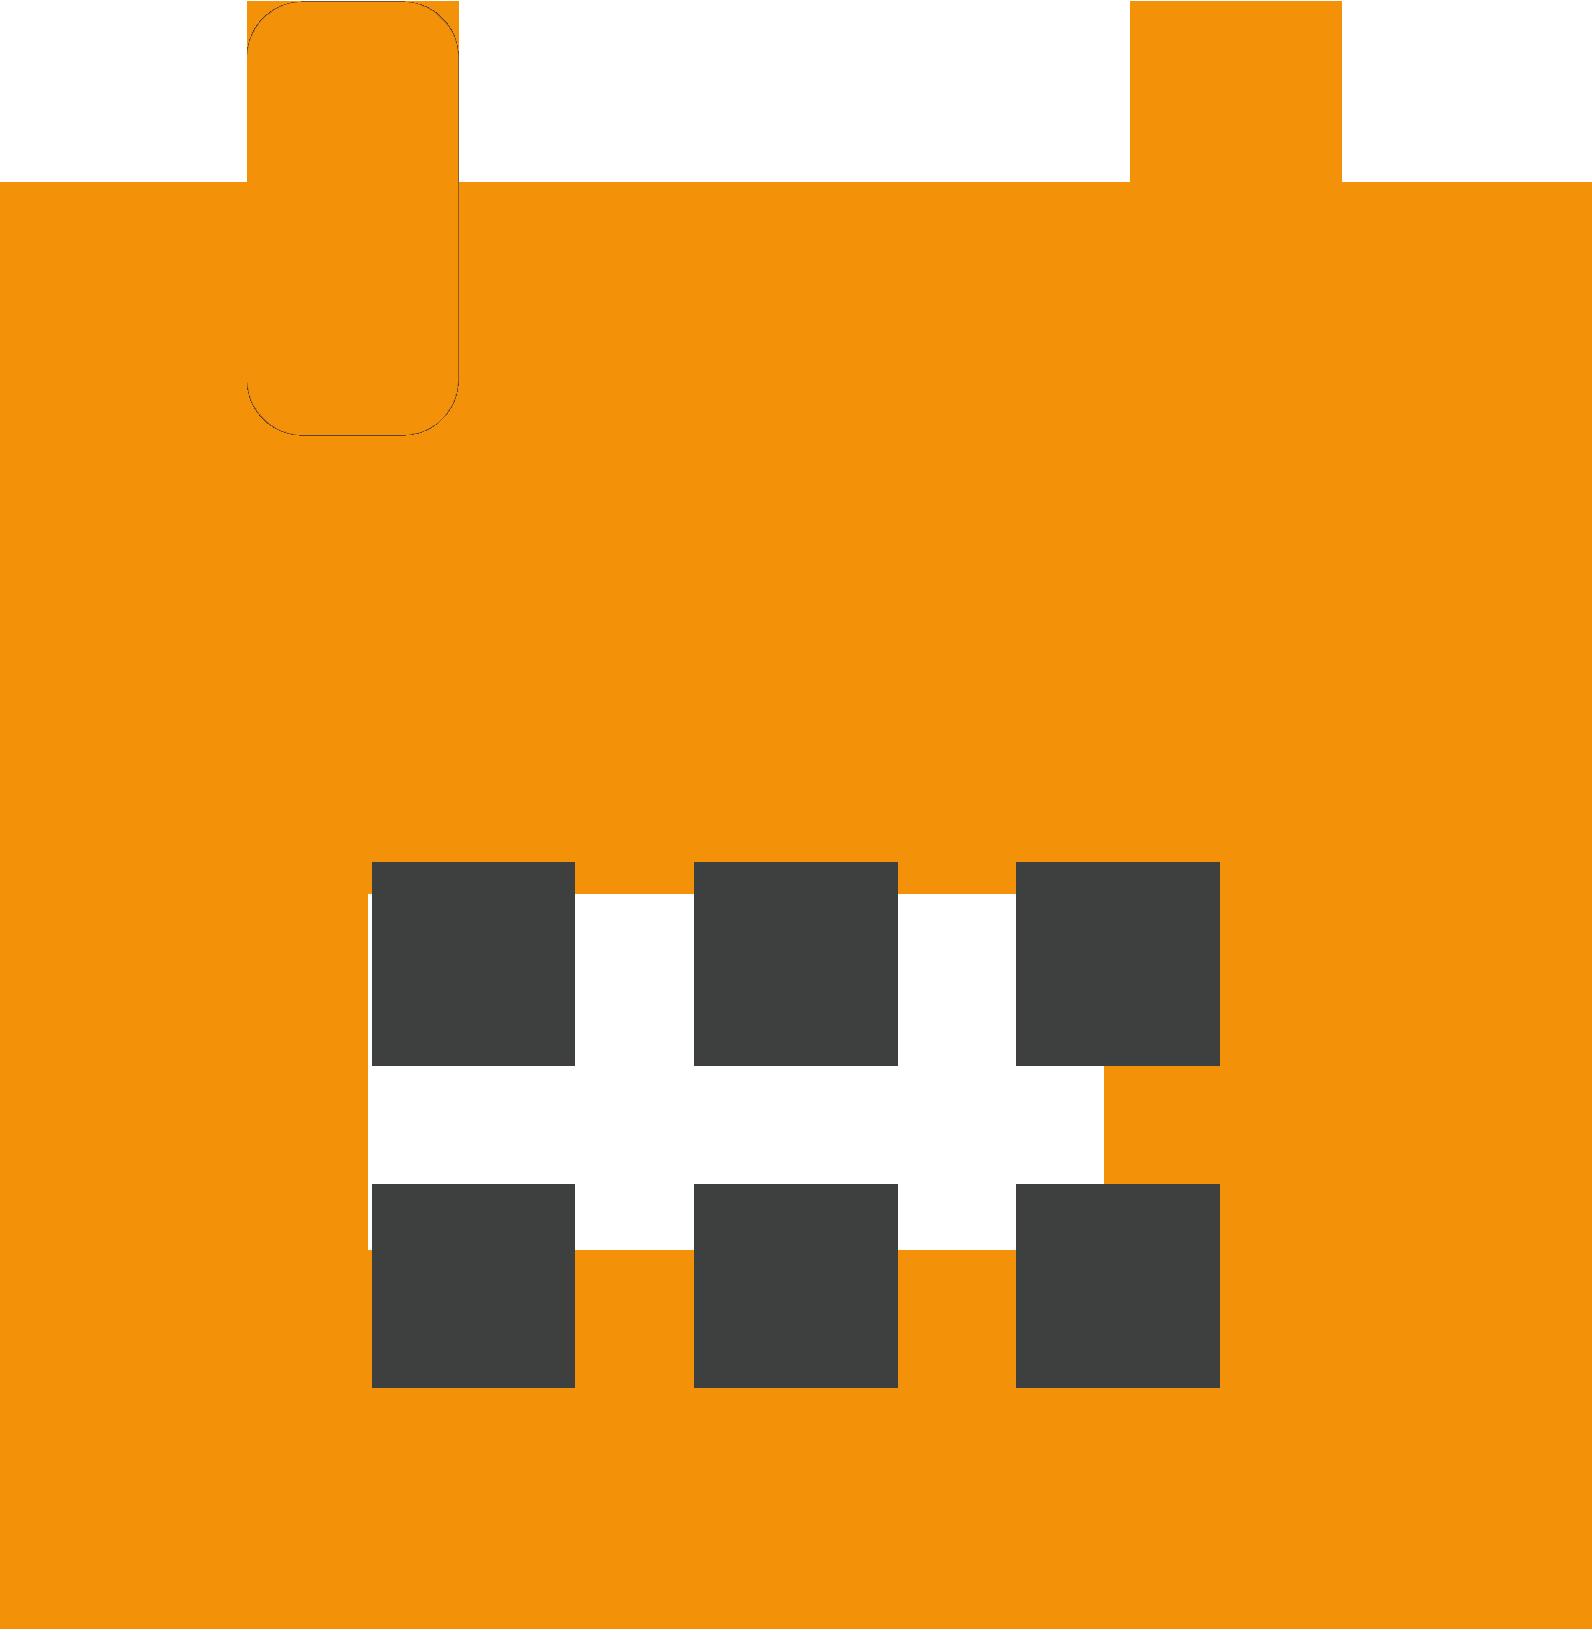 November 9th calendar clipart picture freeuse Training course calendar - IESPM GROUPIESPM GROUP picture freeuse